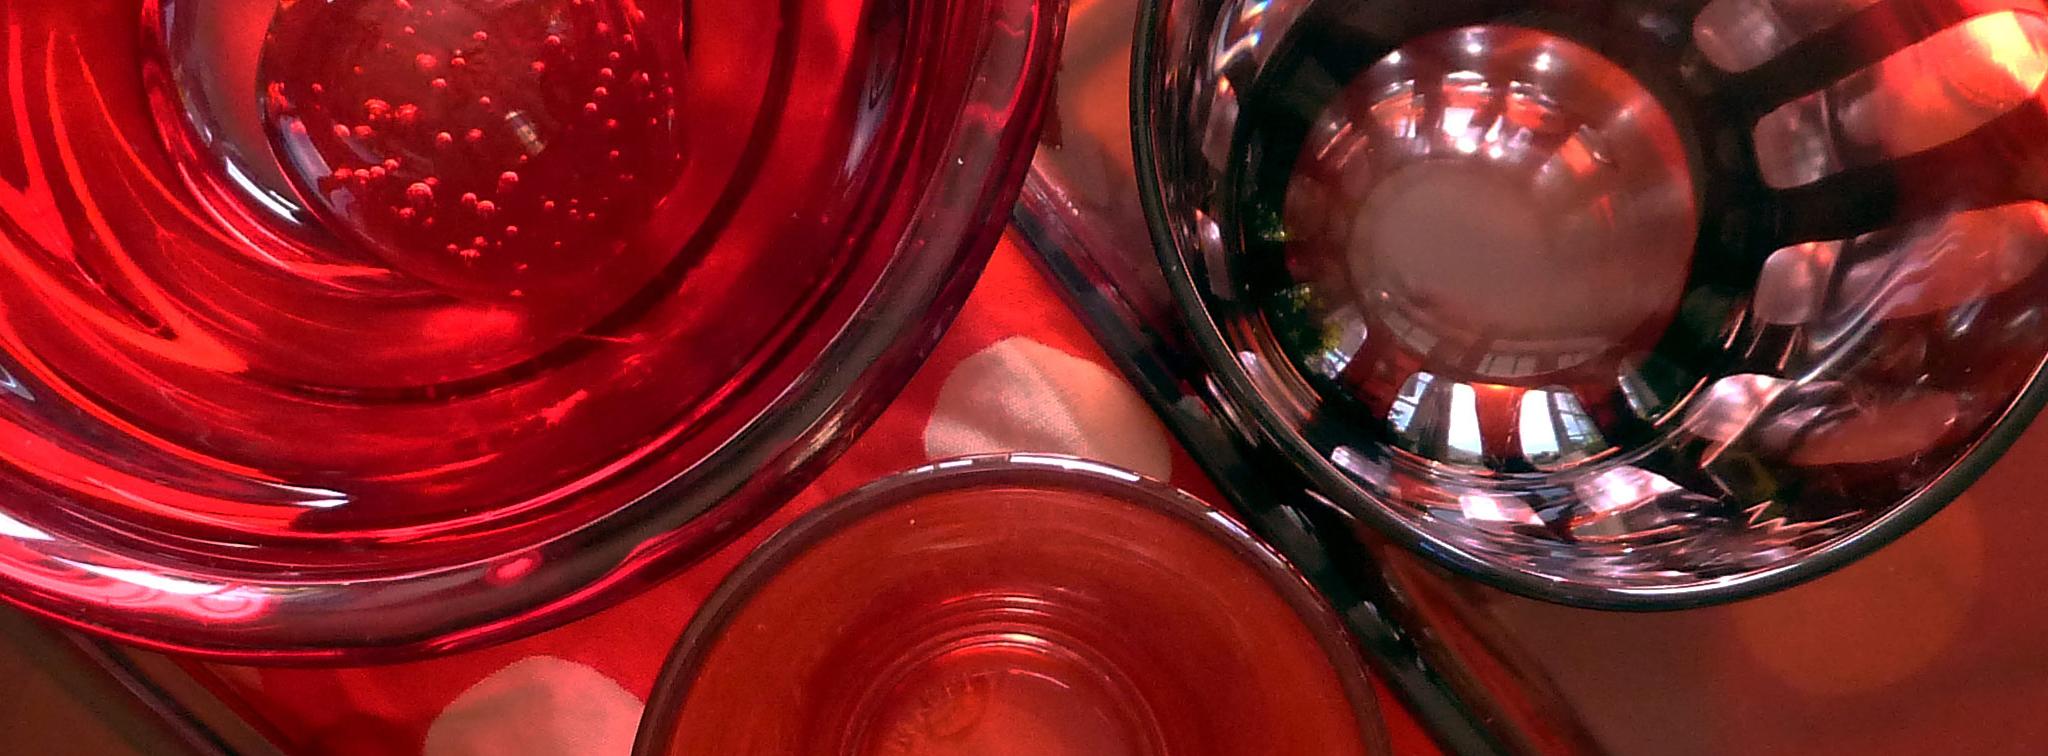 objekte aus rotem glas detail